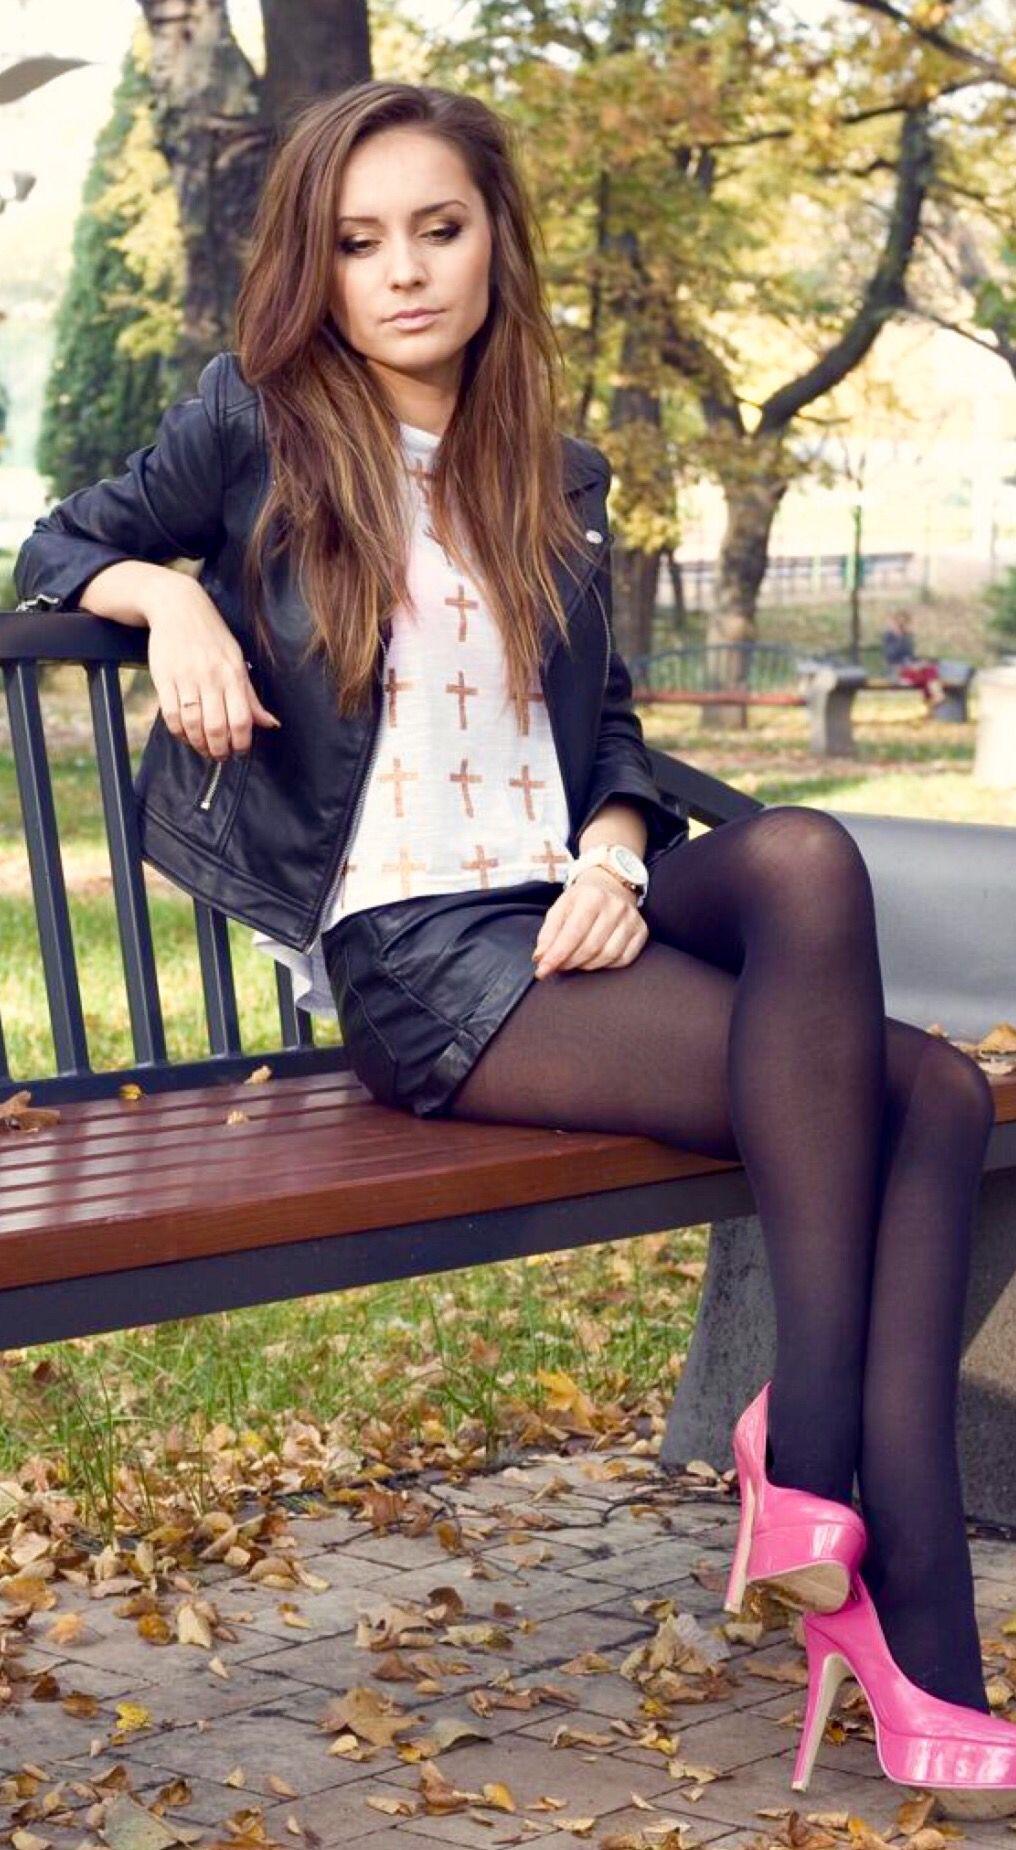 Sheer Pantyhose Luxuriates